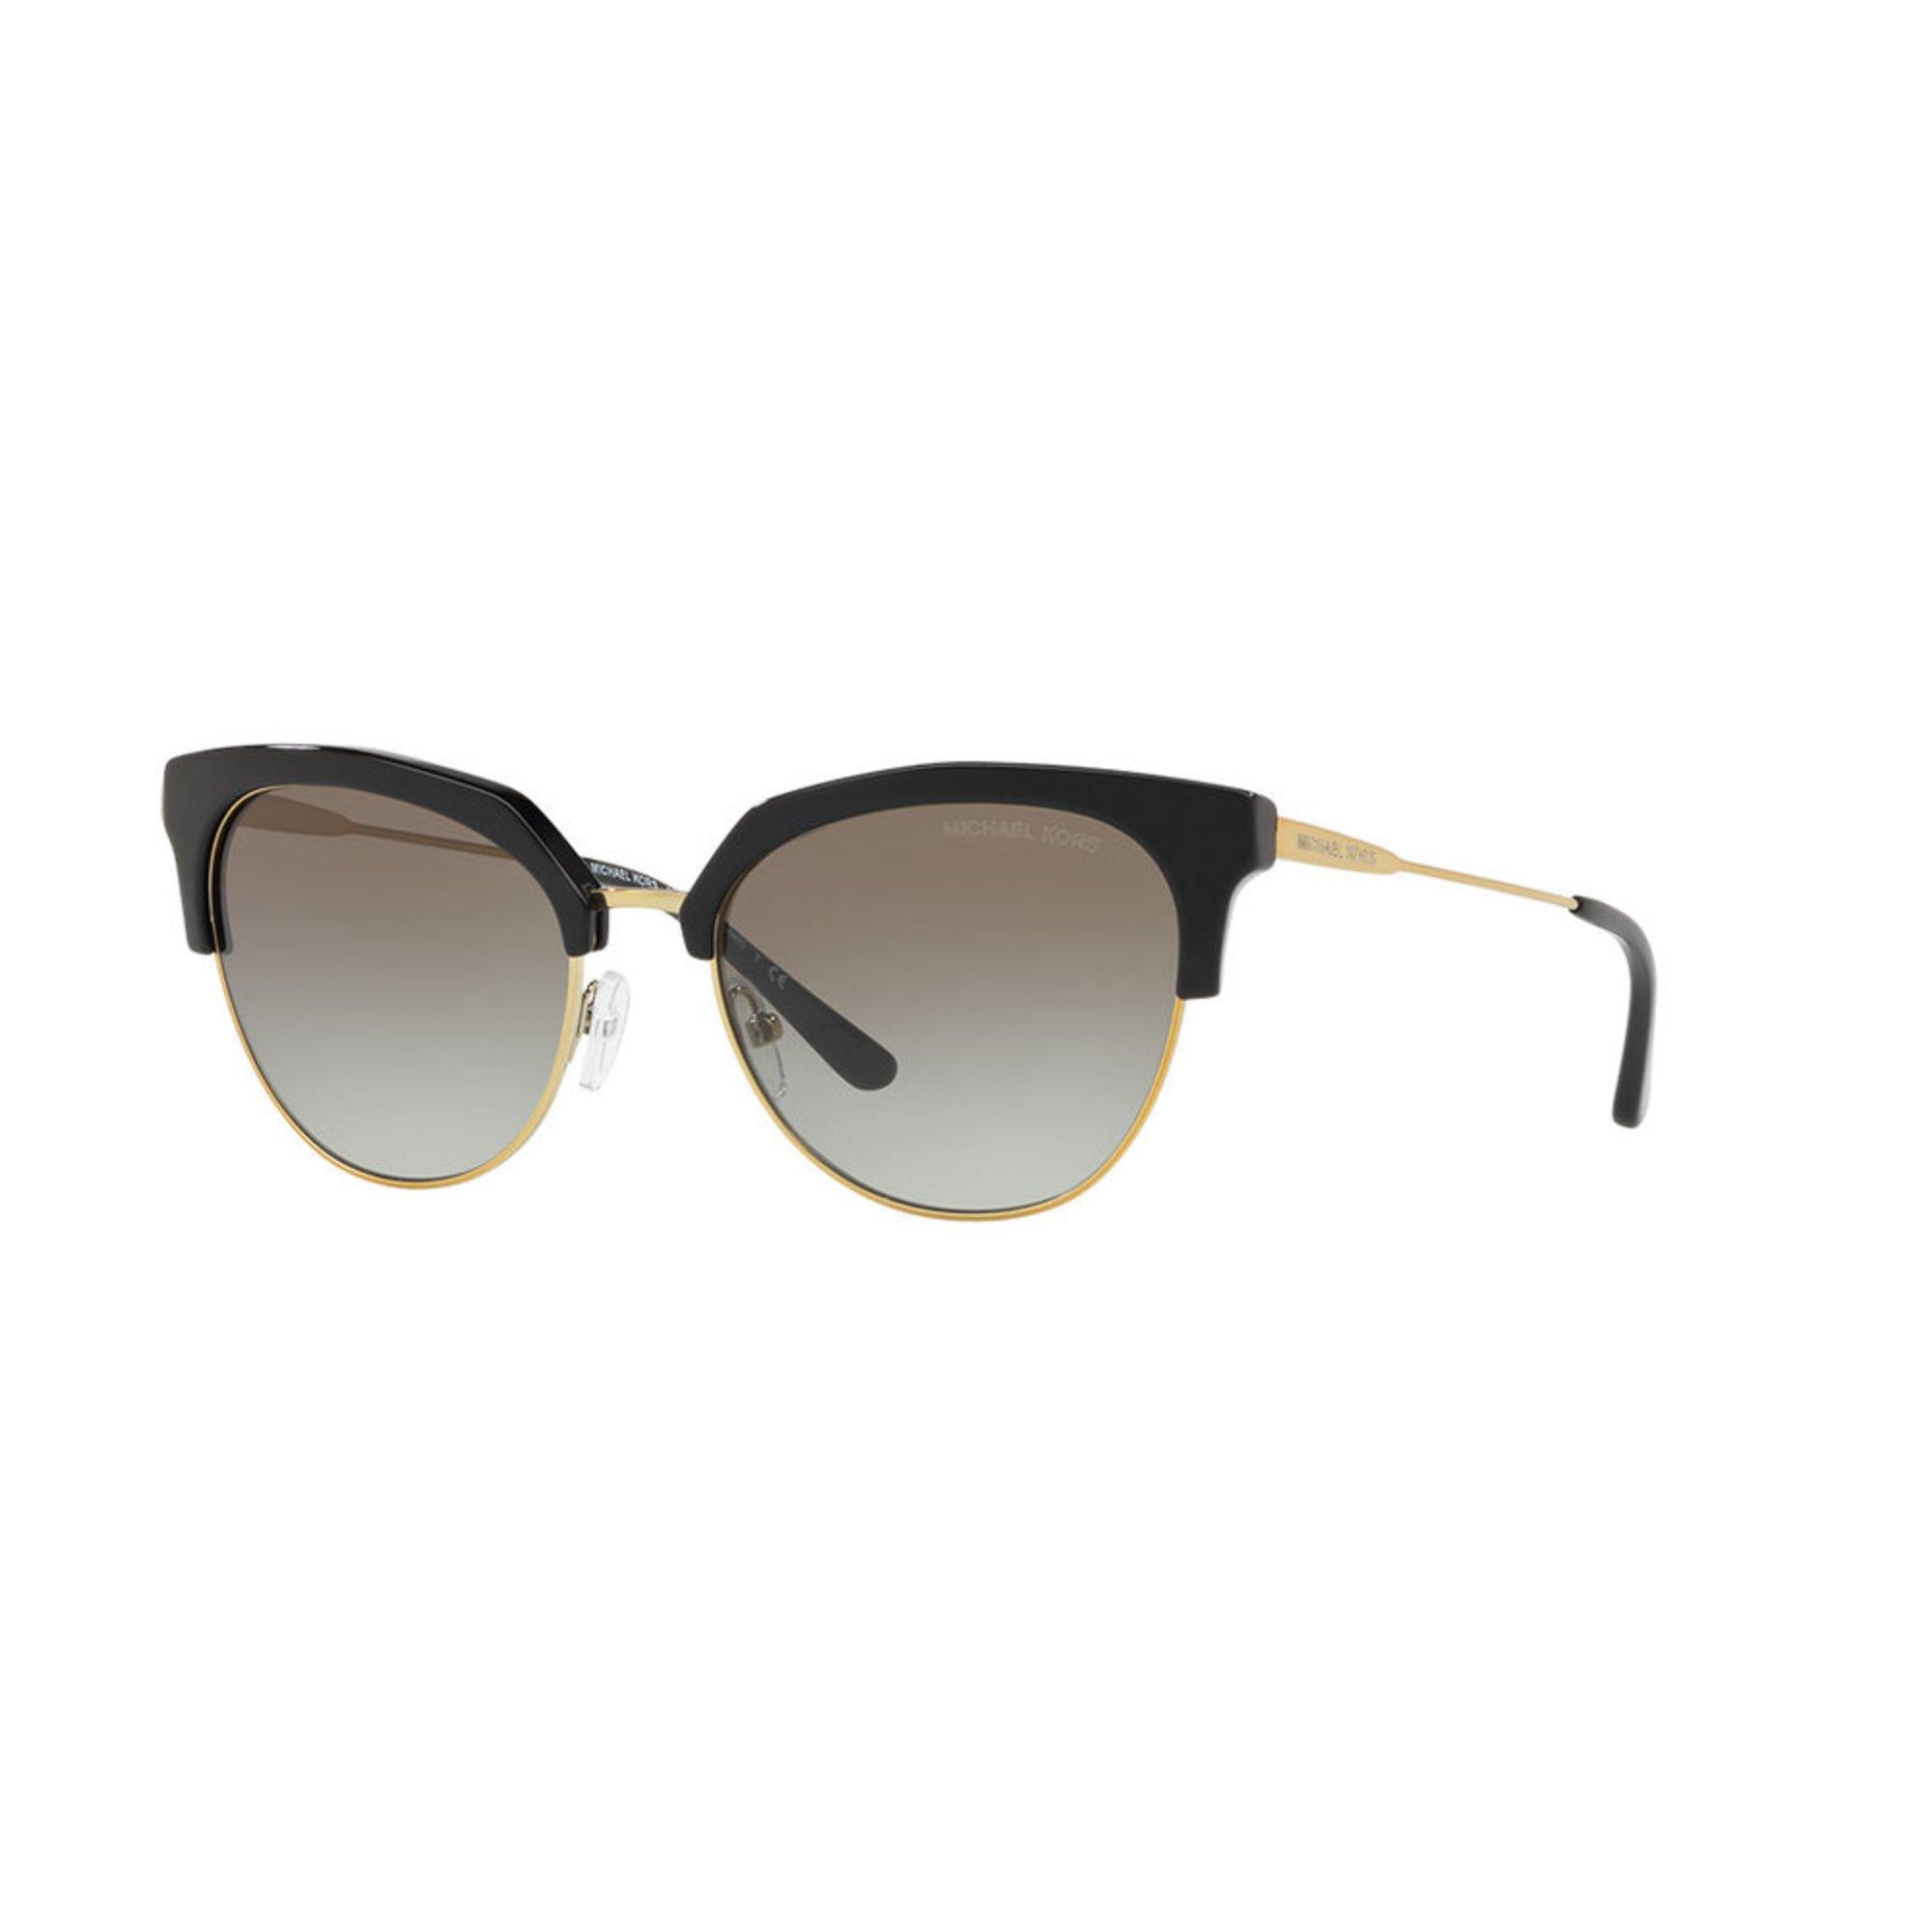 e689c71770a5 Michael Kors Women's Savannah Sunglasses | Search Results ...